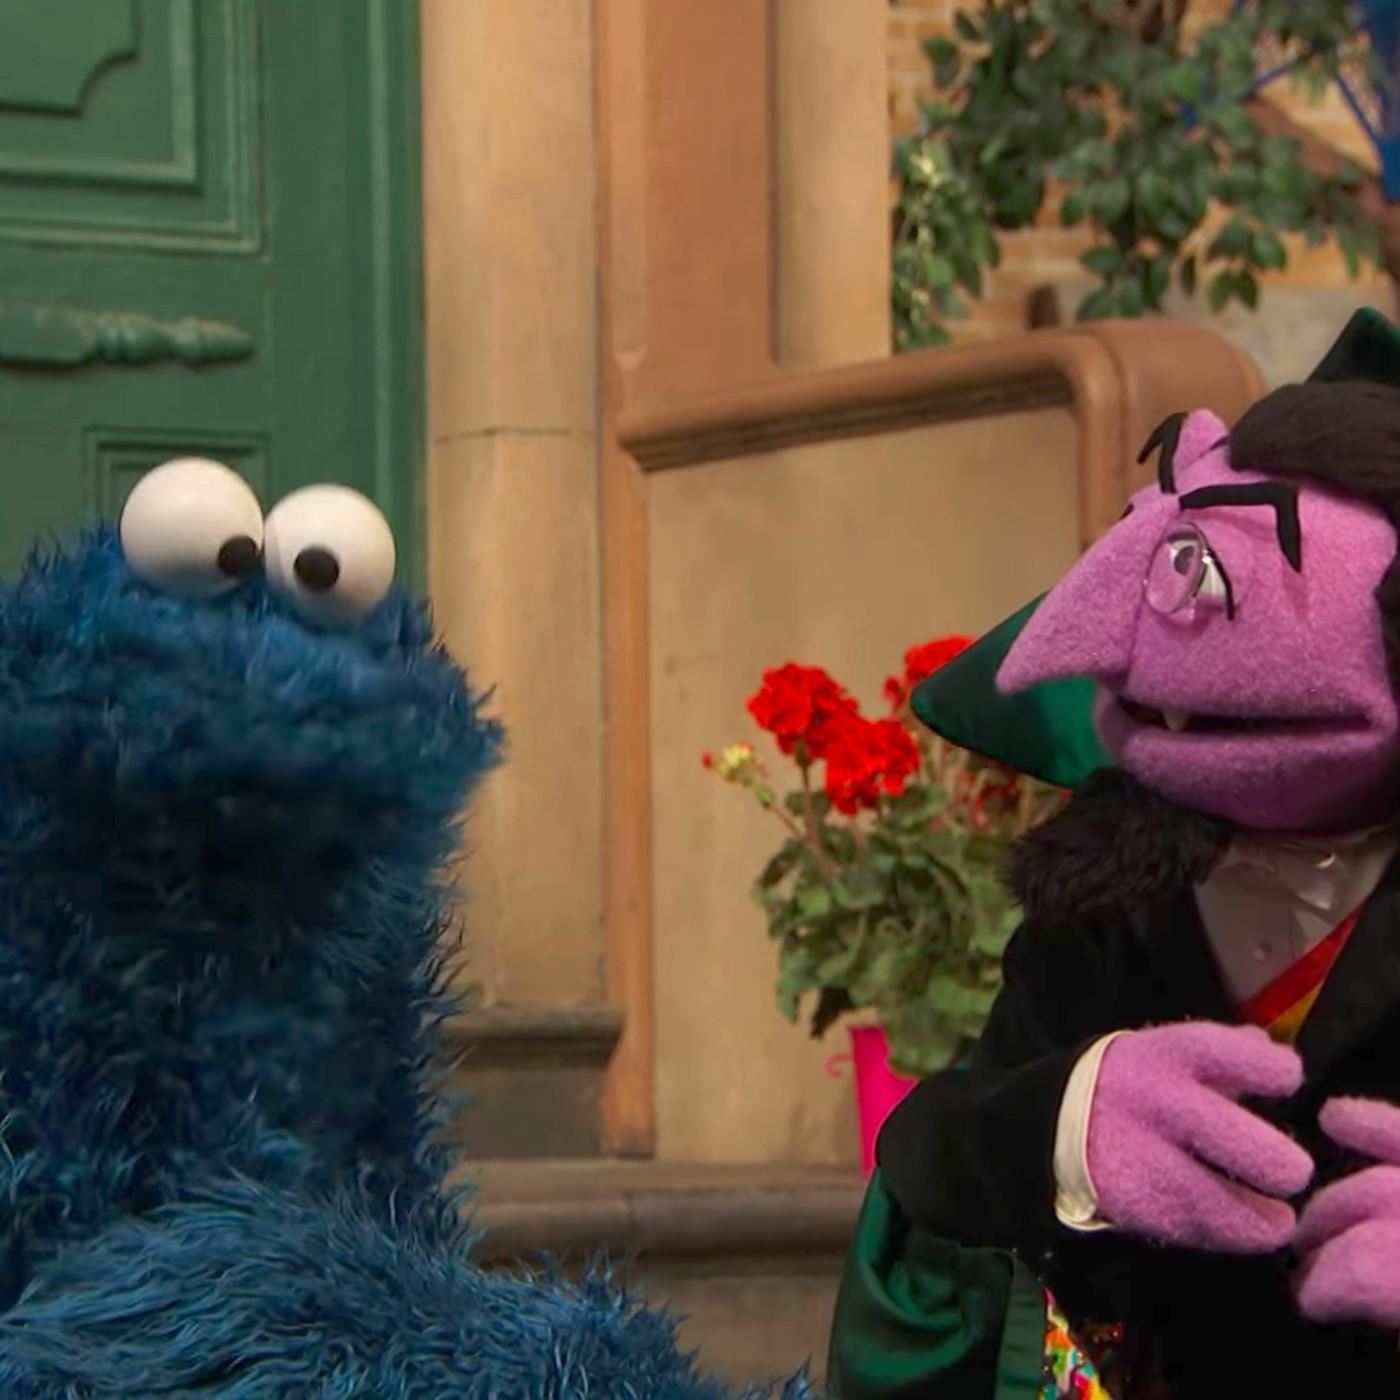 Sesame Street's Traumatic Experiences helps kids cope with trauma - Vox